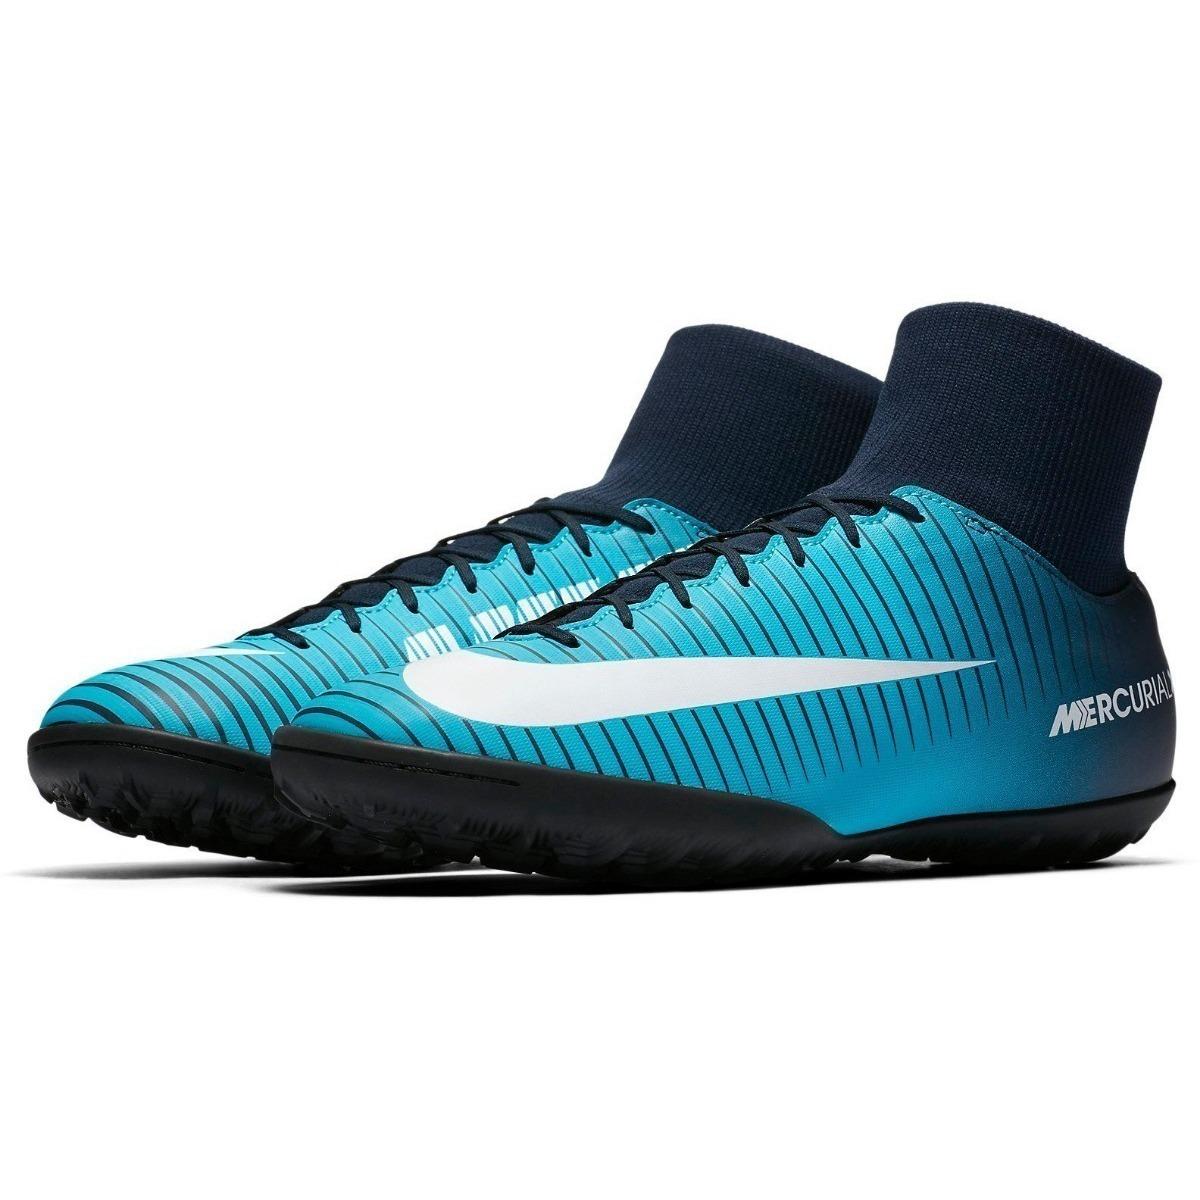 Chuteira Nike Mercurial Victory 6 Vi Df Tf Society Botinha - R  299 ... b9a606c13f6f0